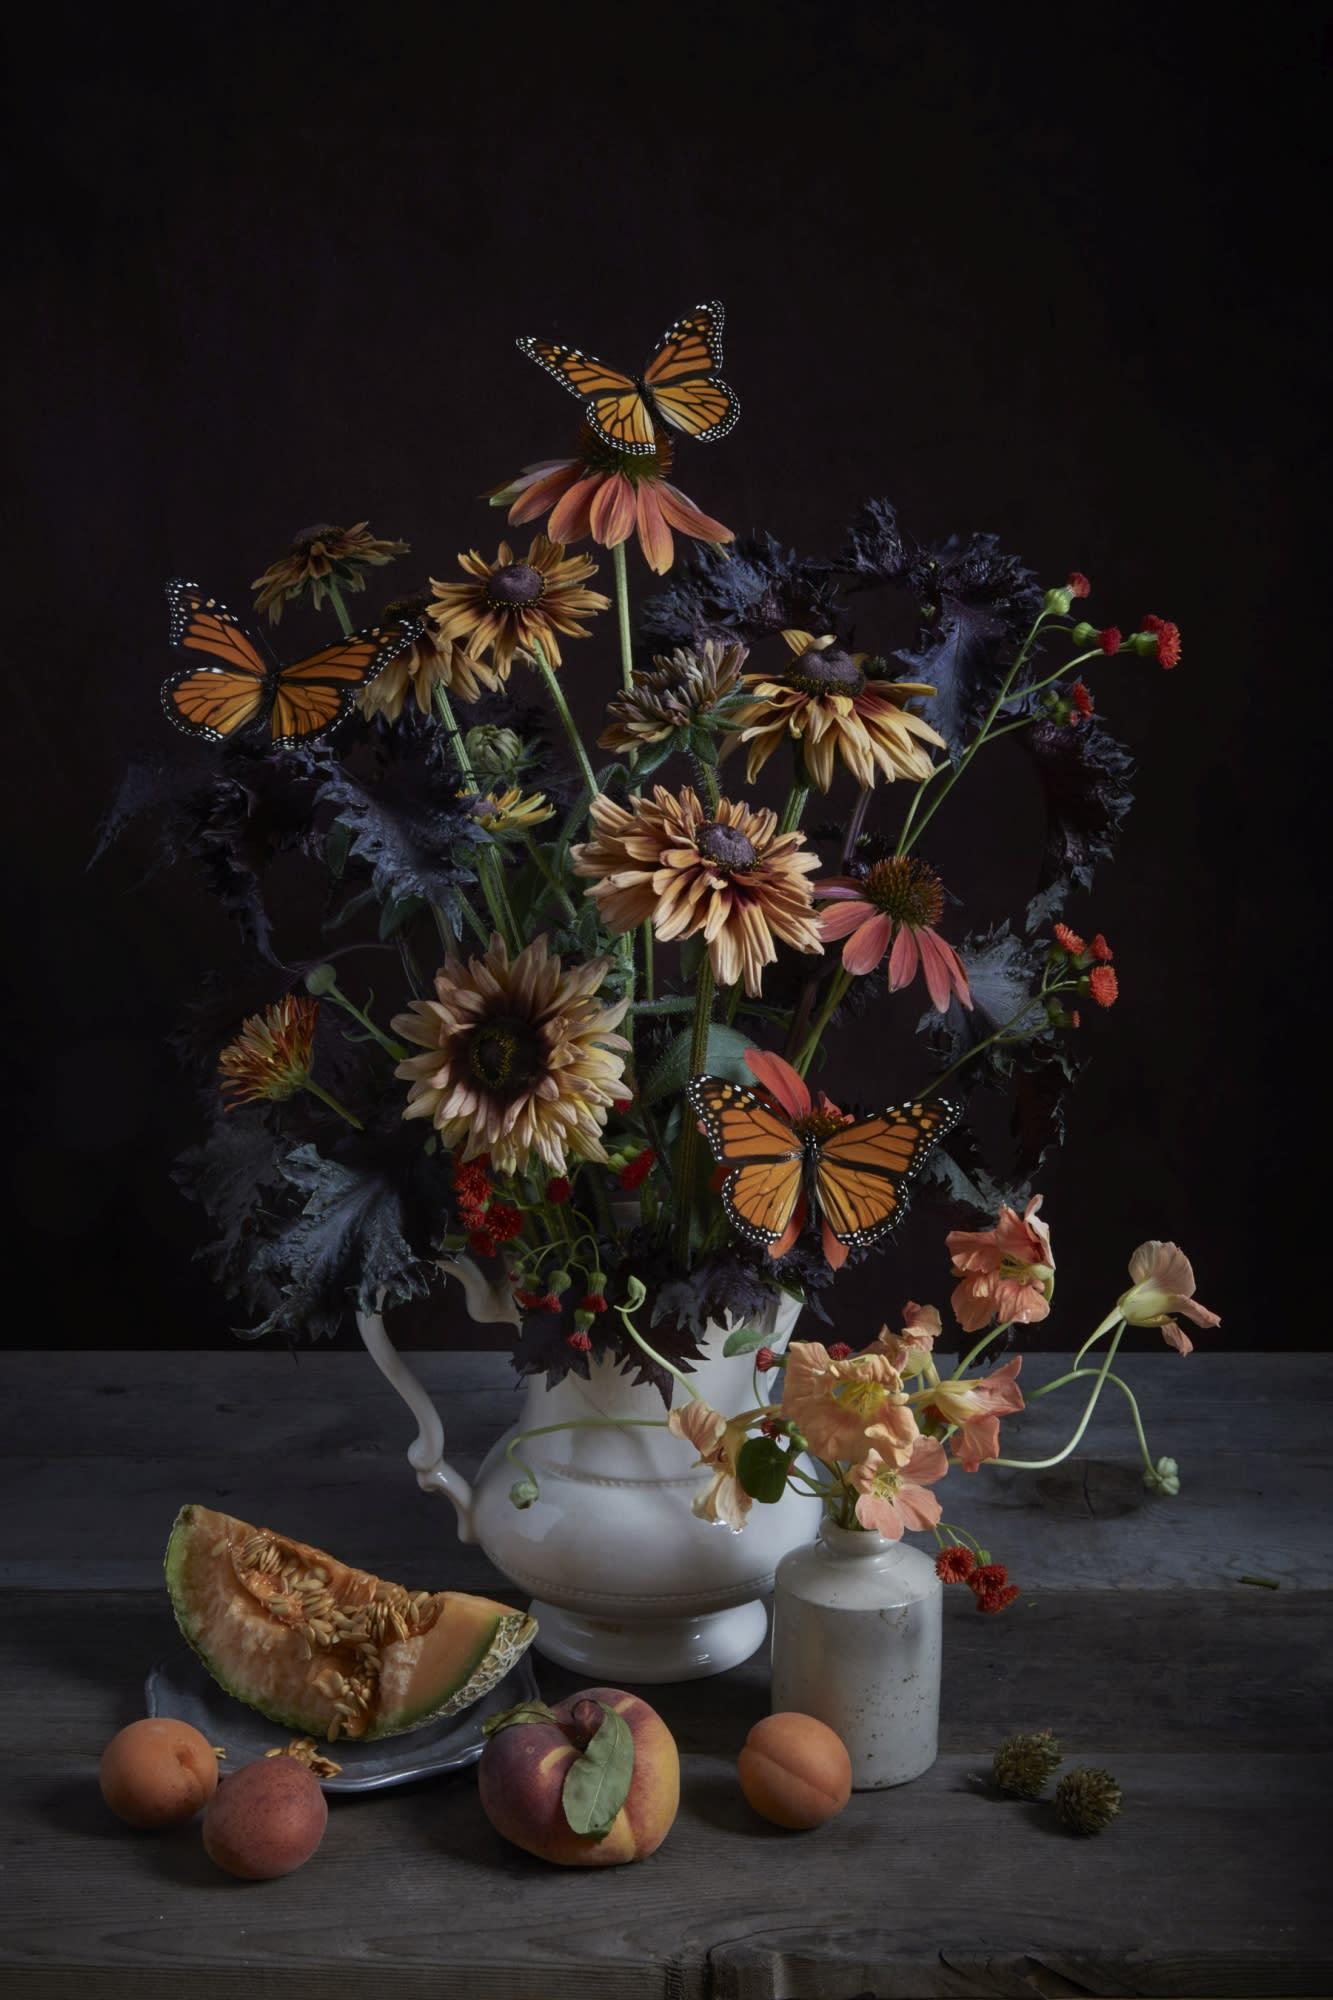 'Monarch & Rudbeckia' by Kristin Sjaarda at Gallery 133